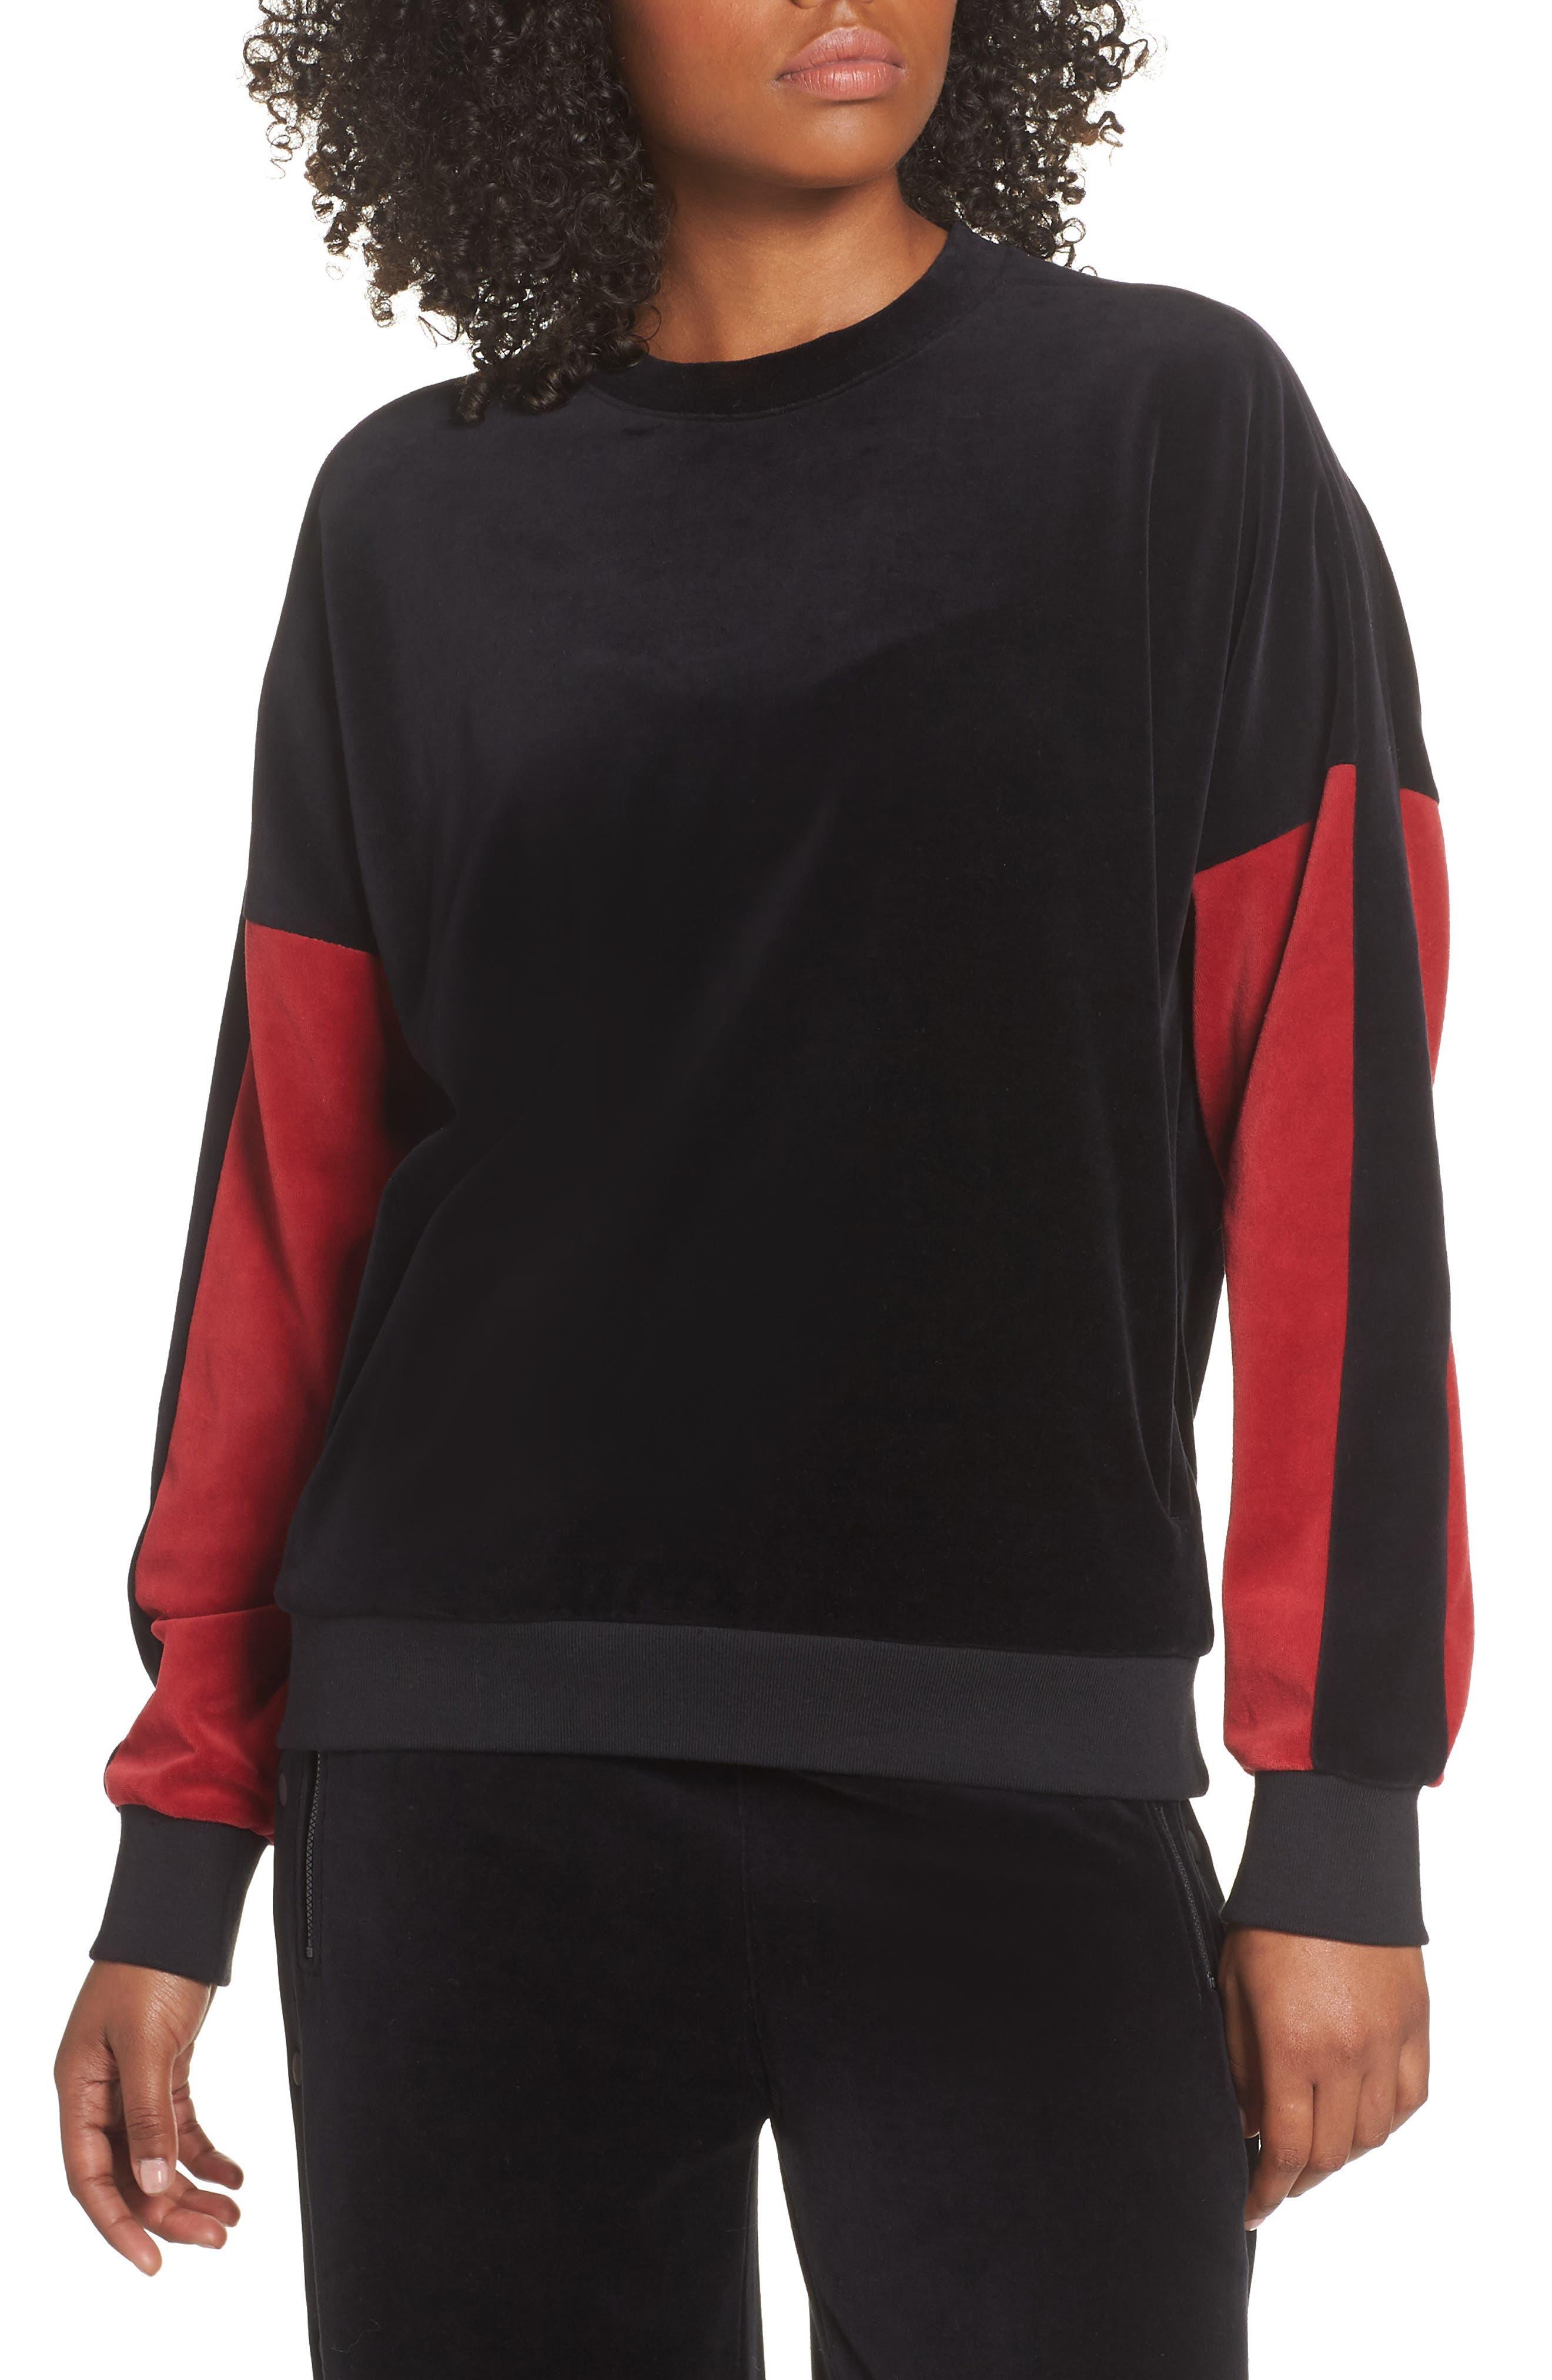 Velour Crewneck Sweater,                         Main,                         color, BLACK/ CRIMSON